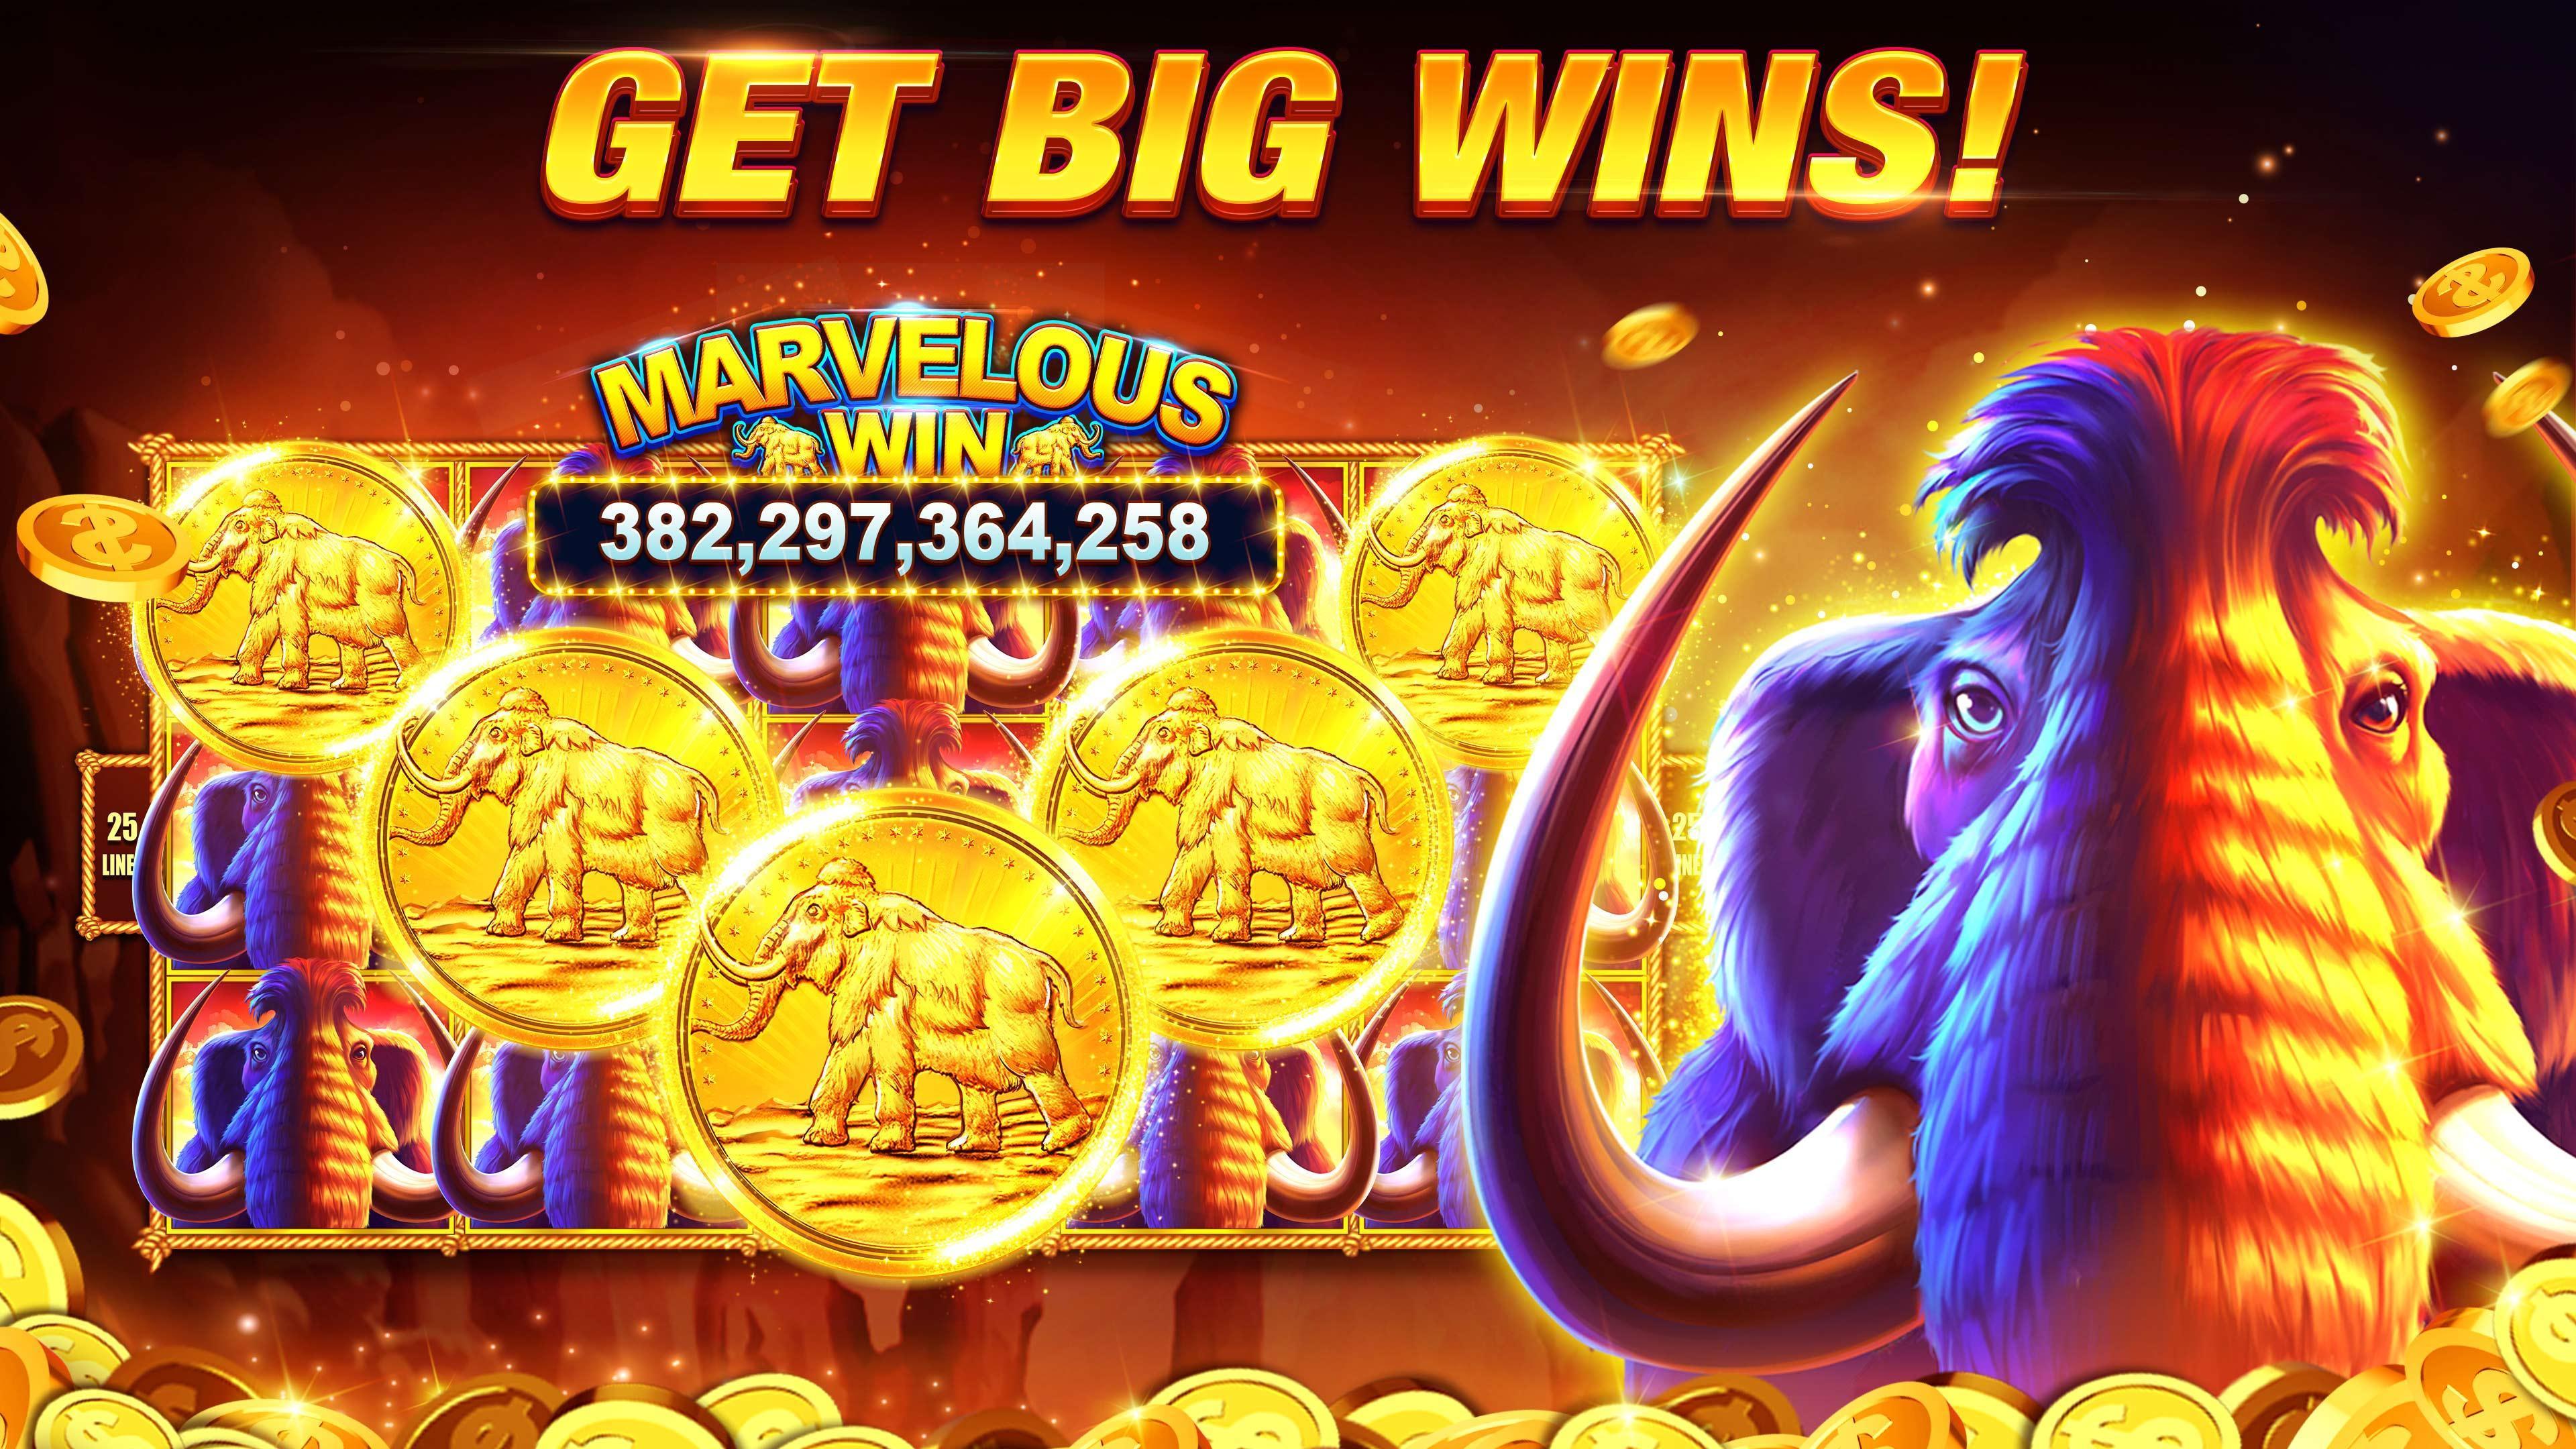 Slots Casino - Jackpot Mania 1.84.1 Screenshot 6